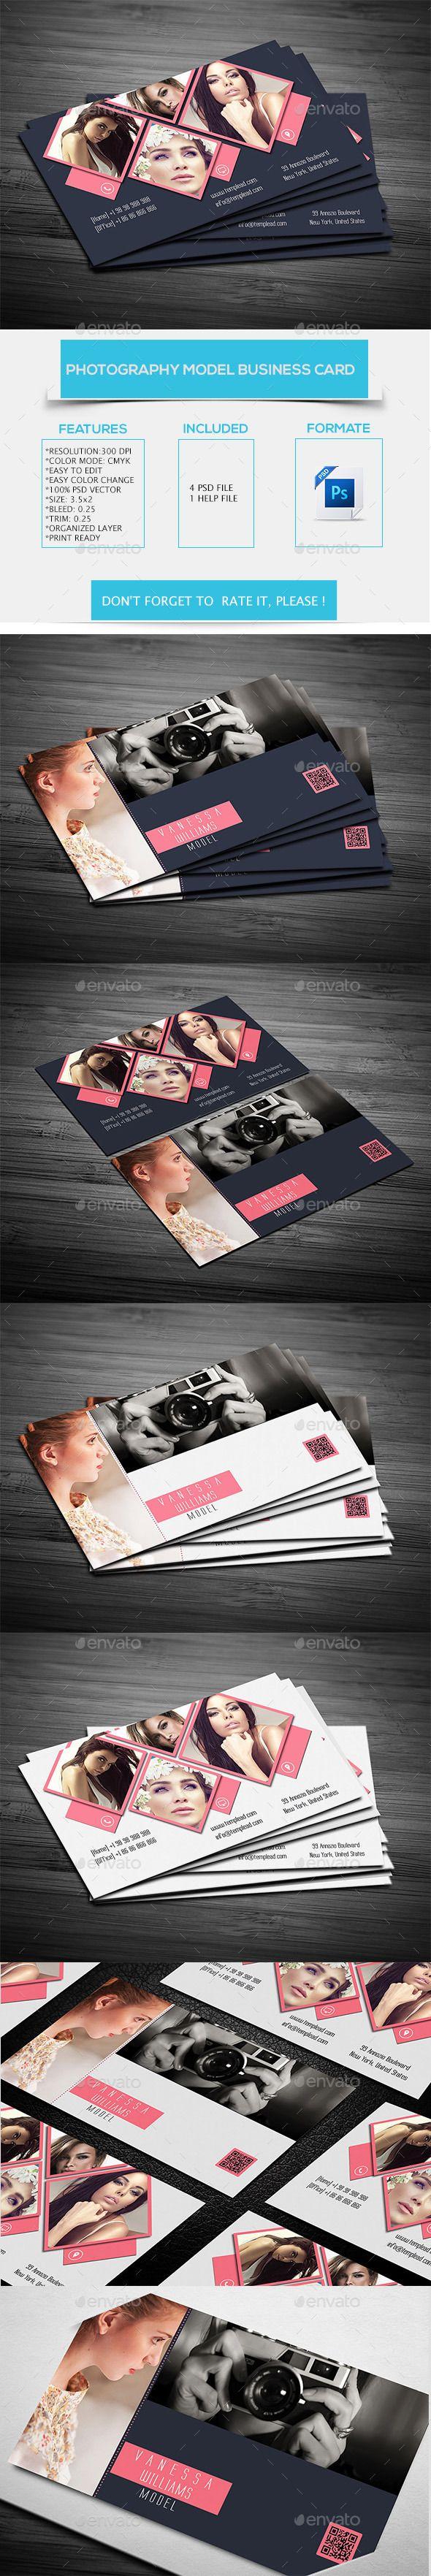 168 best business card design images on pinterest